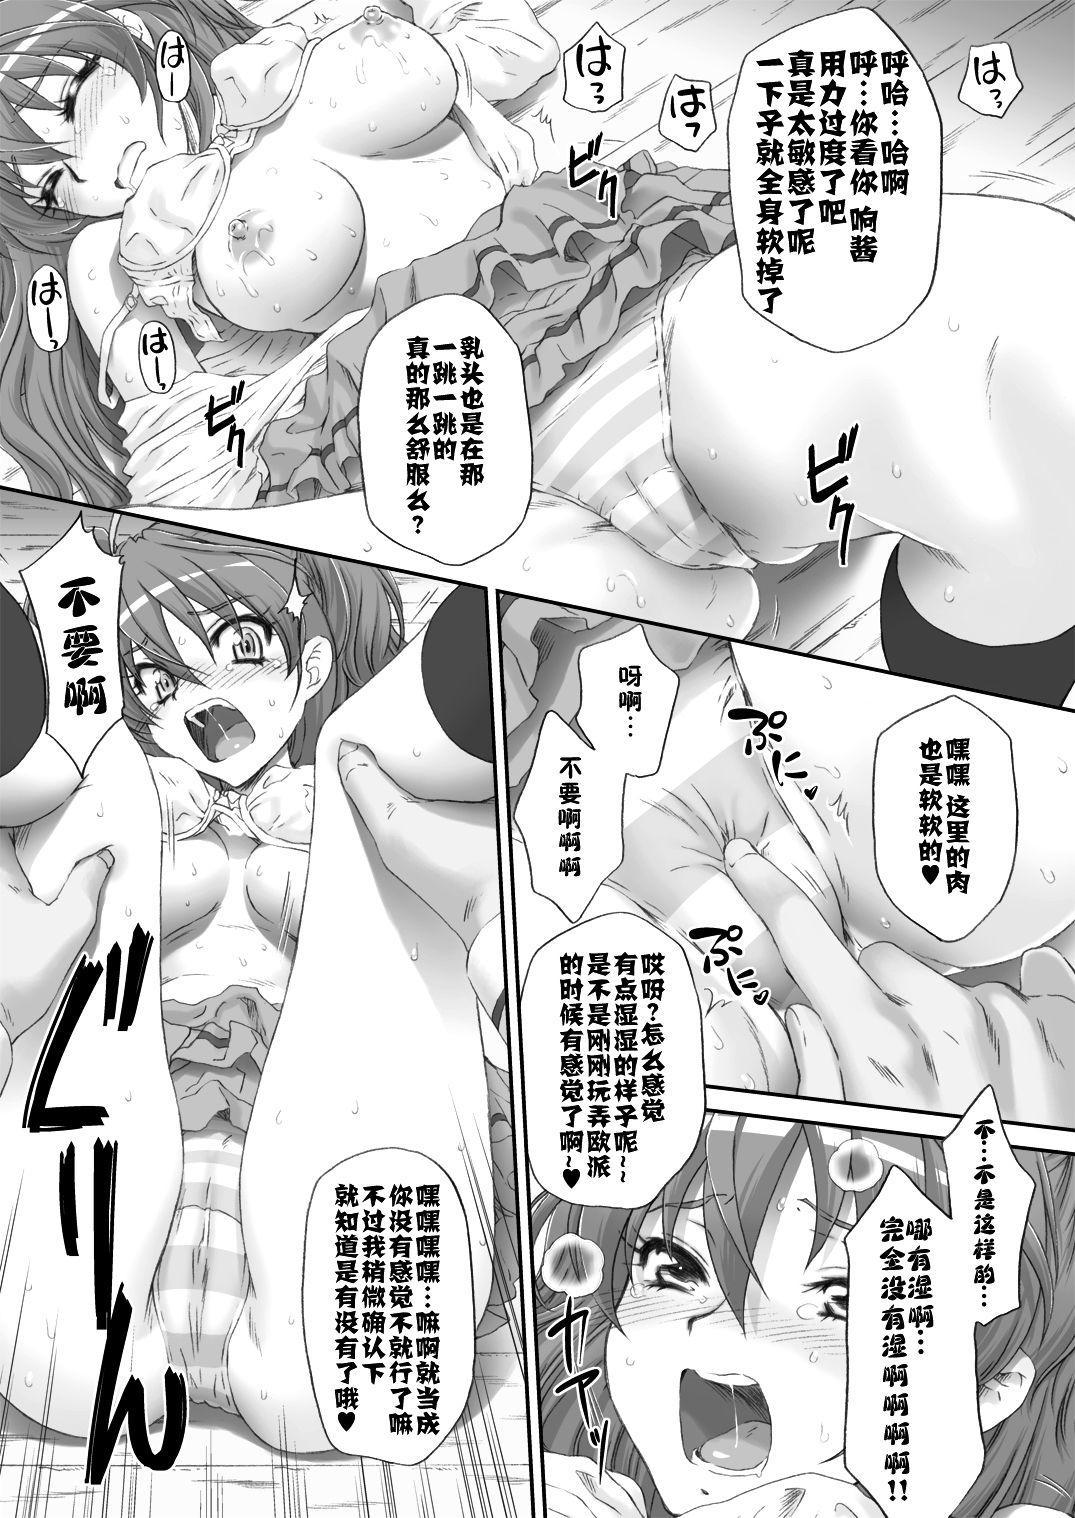 Hibiki de asobou ♪ 10